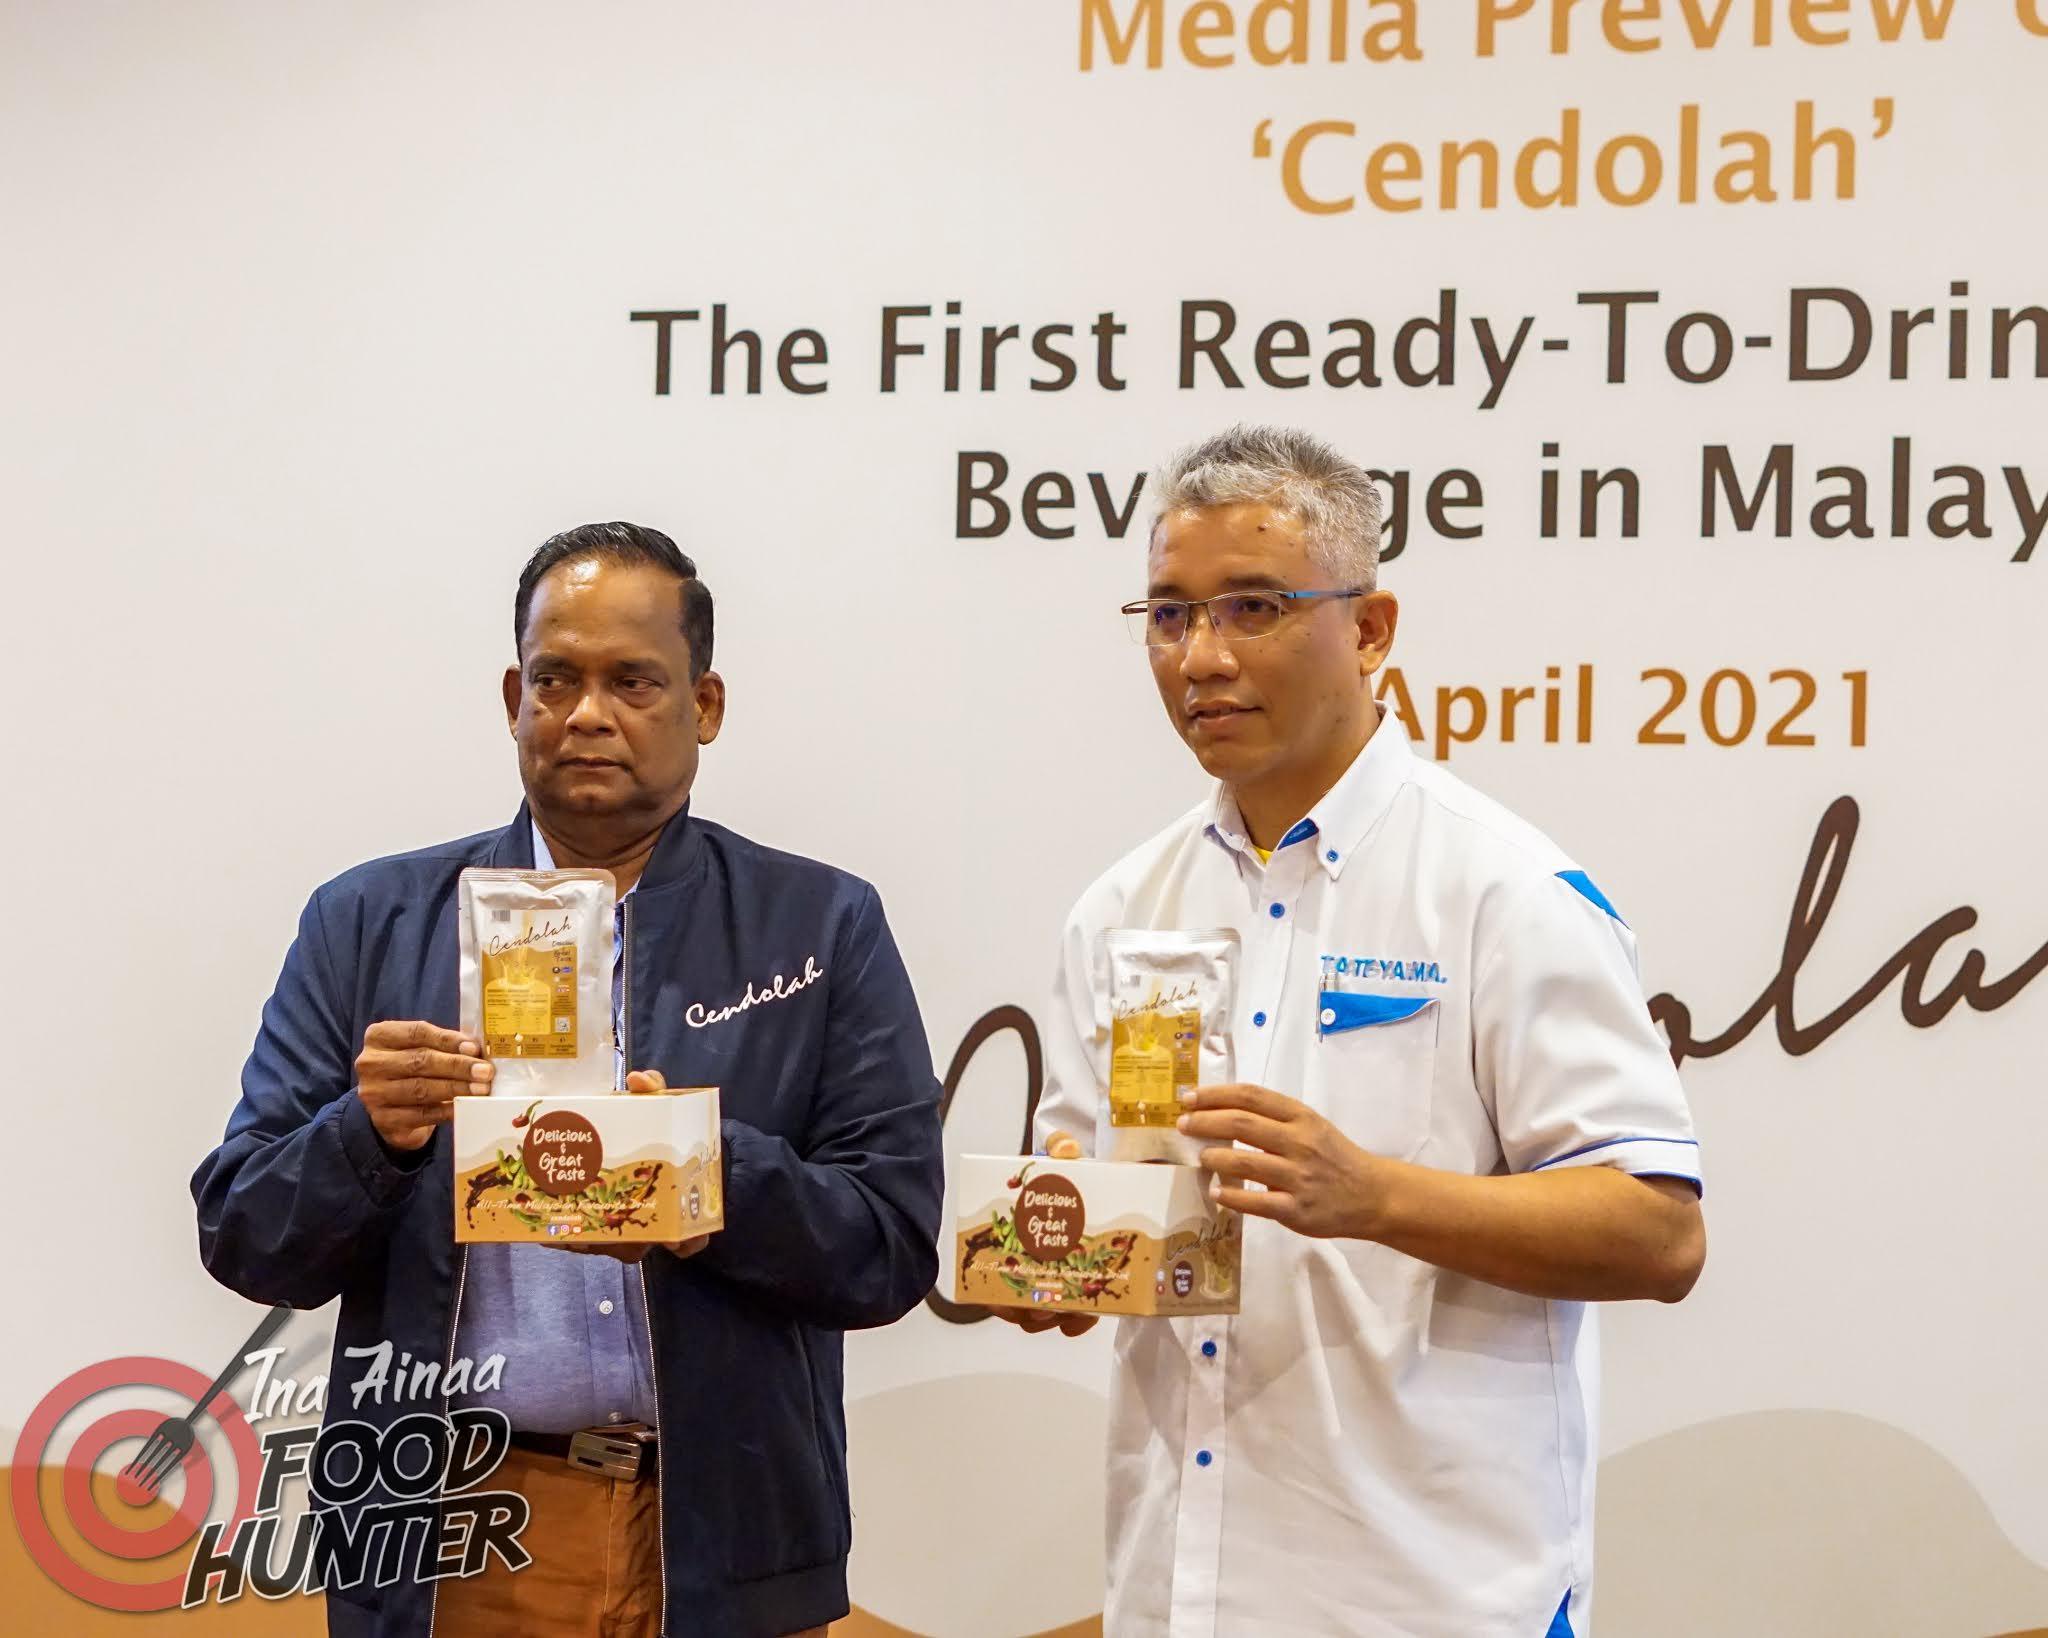 CENDOLAH MALAYSIA - Hak Milik Ina Ainaa